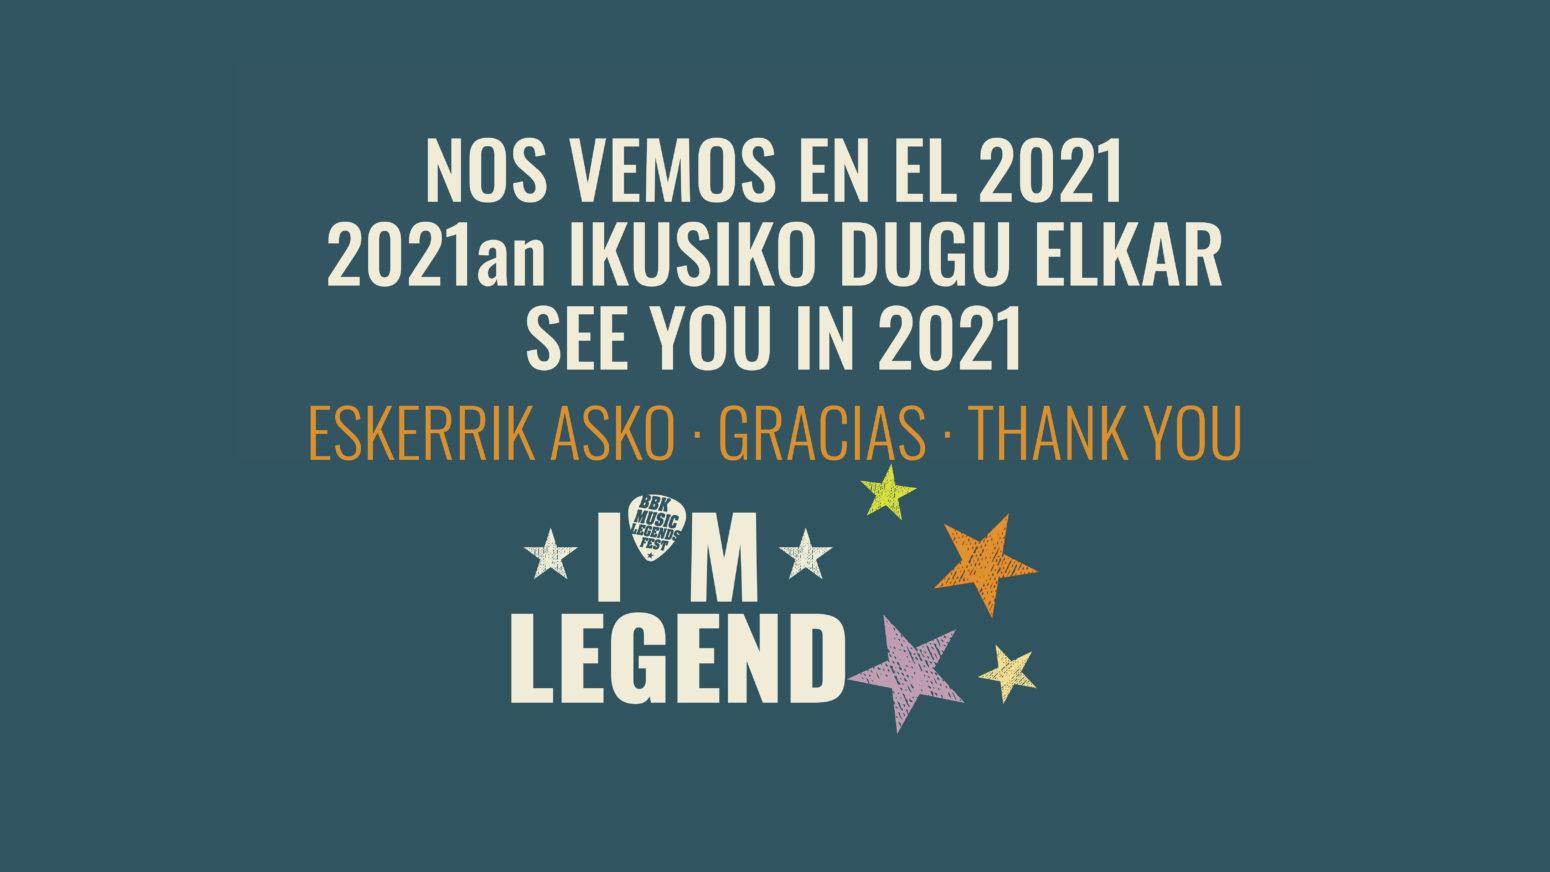 EL BBK MUSIC LEGENDS FESTIVAL APLAZADO AL 2021